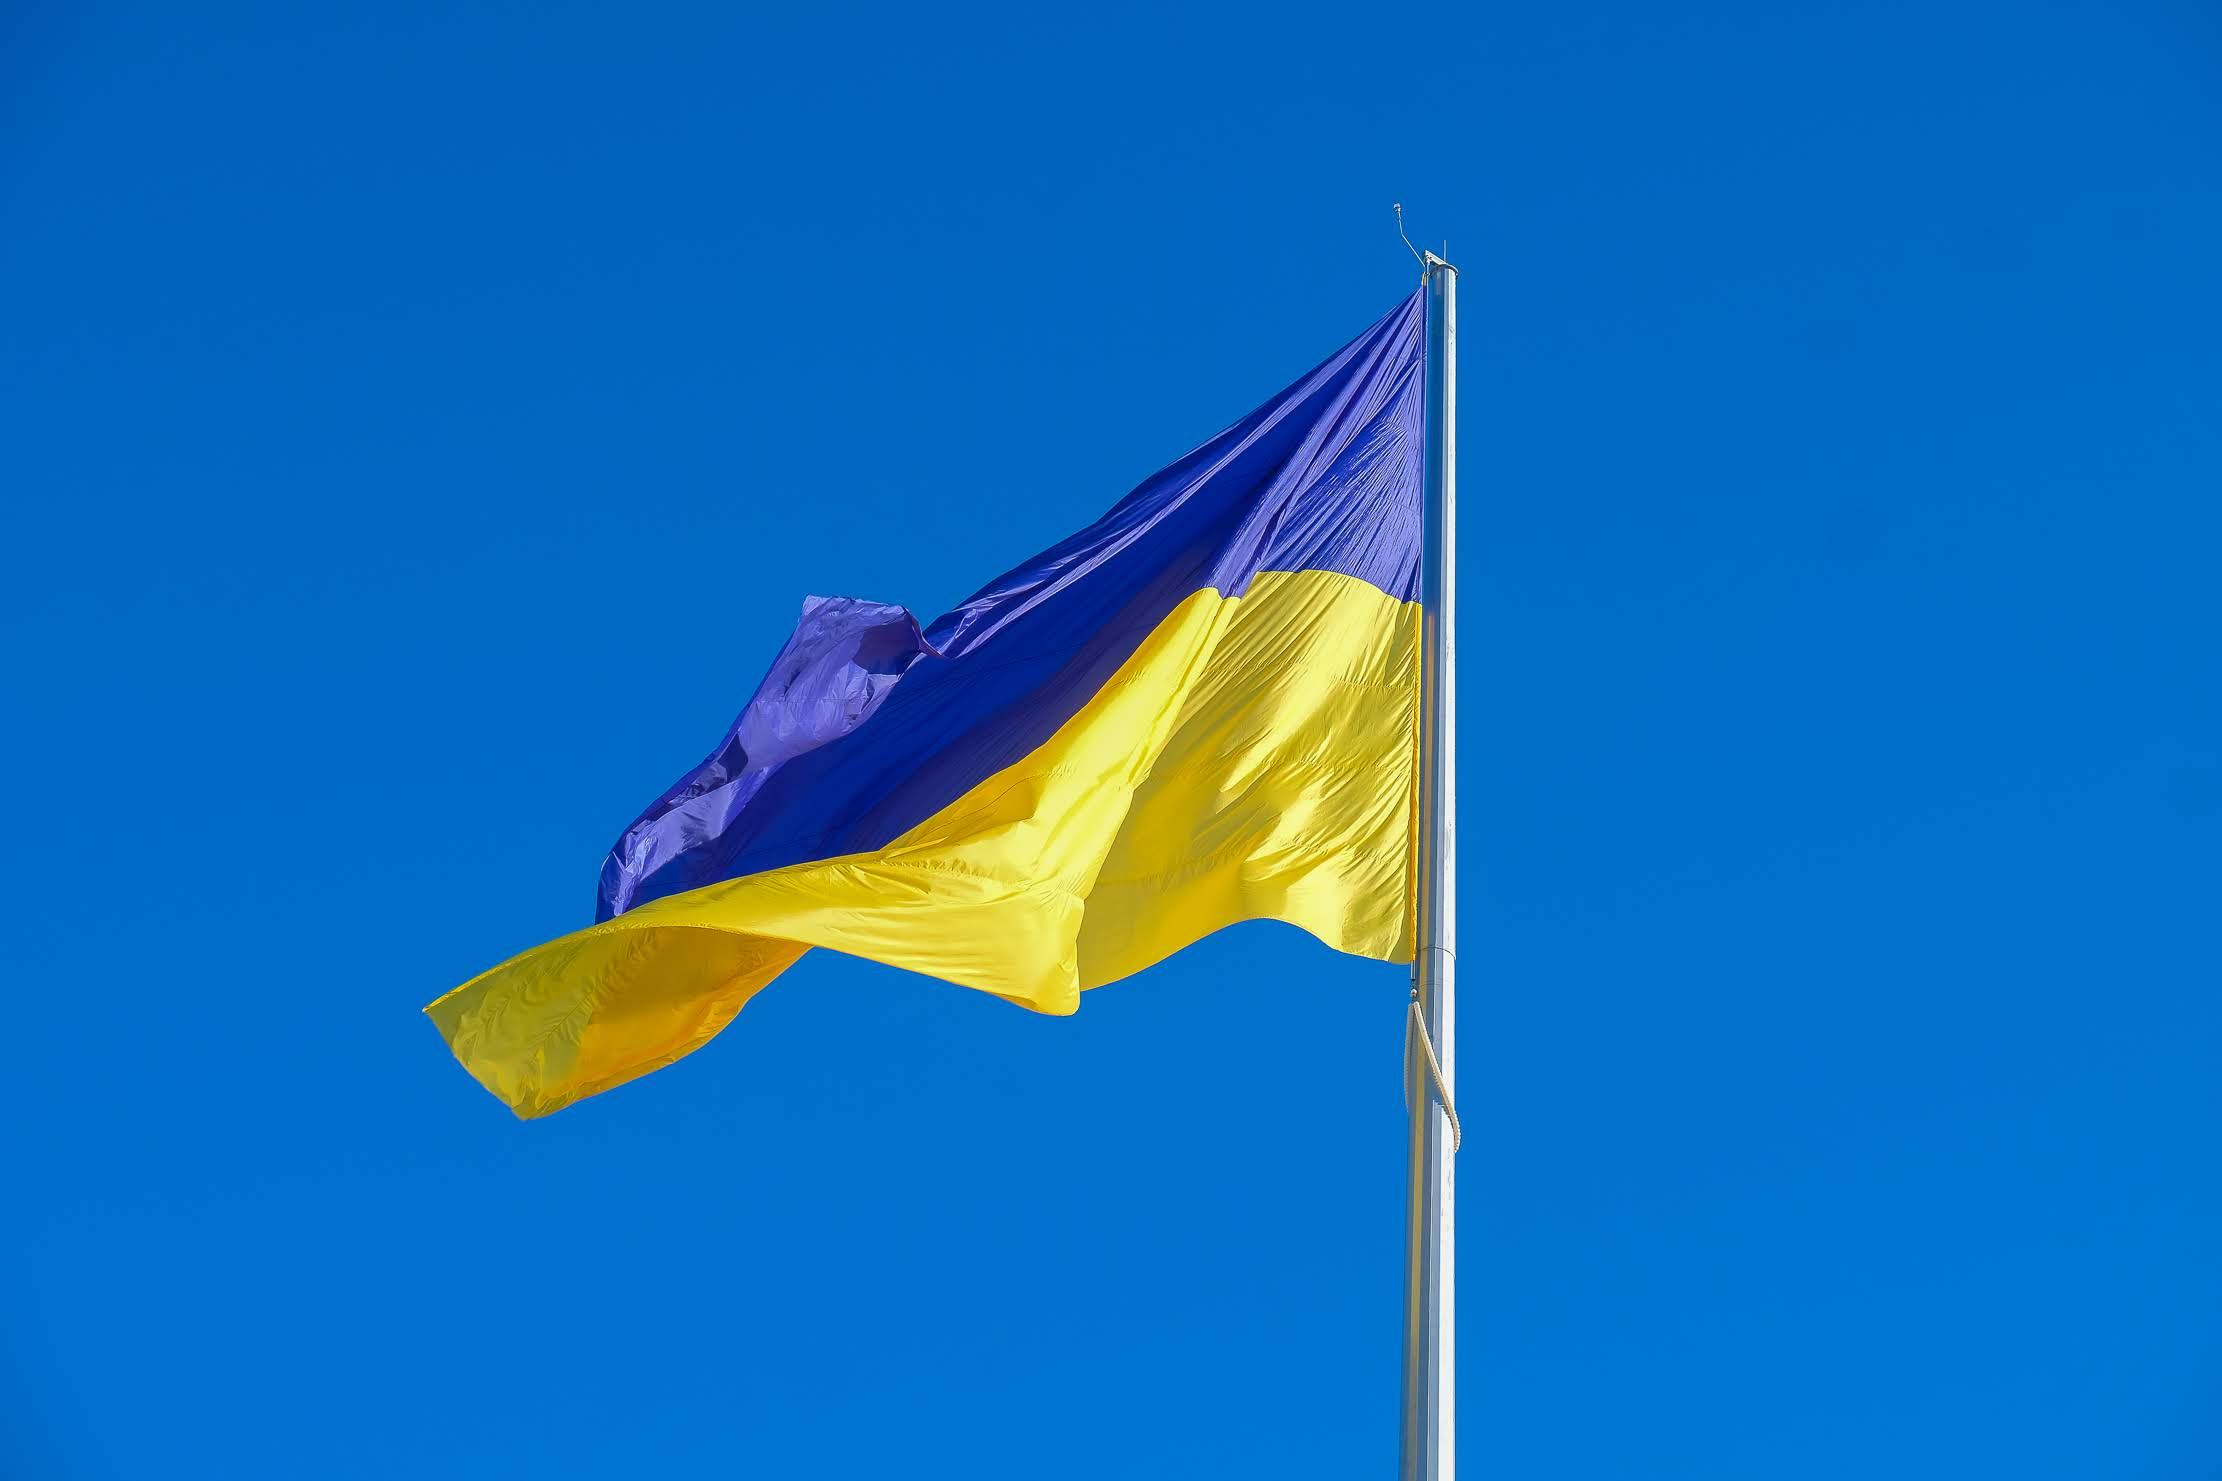 флаг3